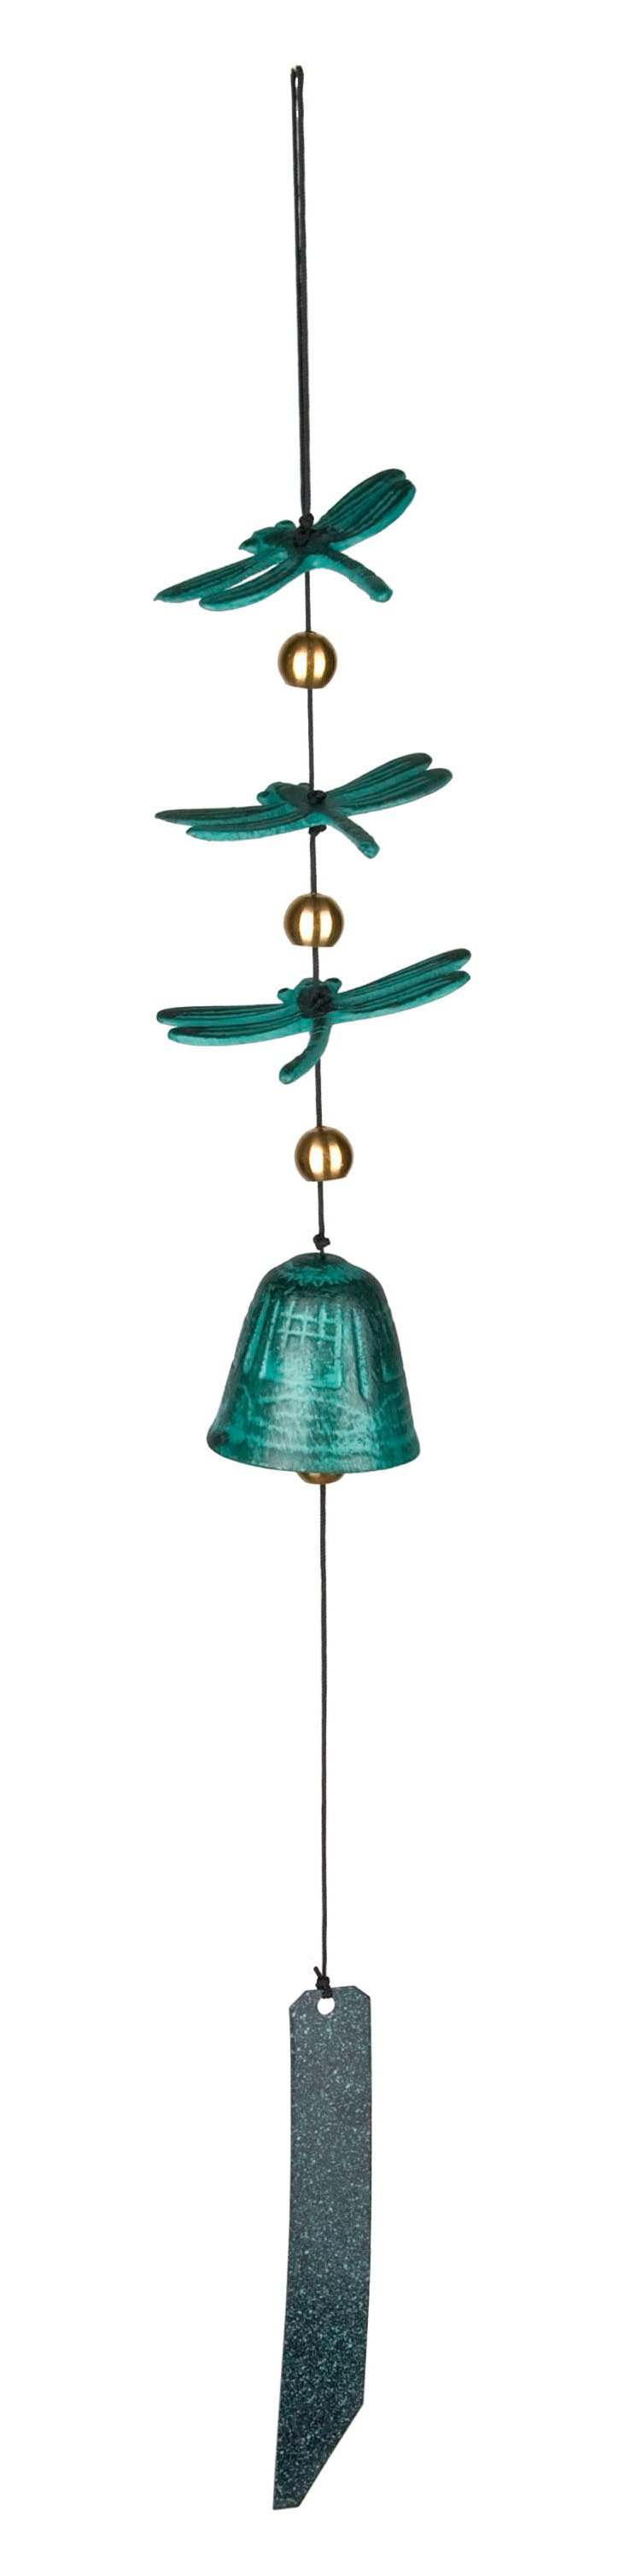 "20"" Habitats Dragonfly Wind Bell, Green"